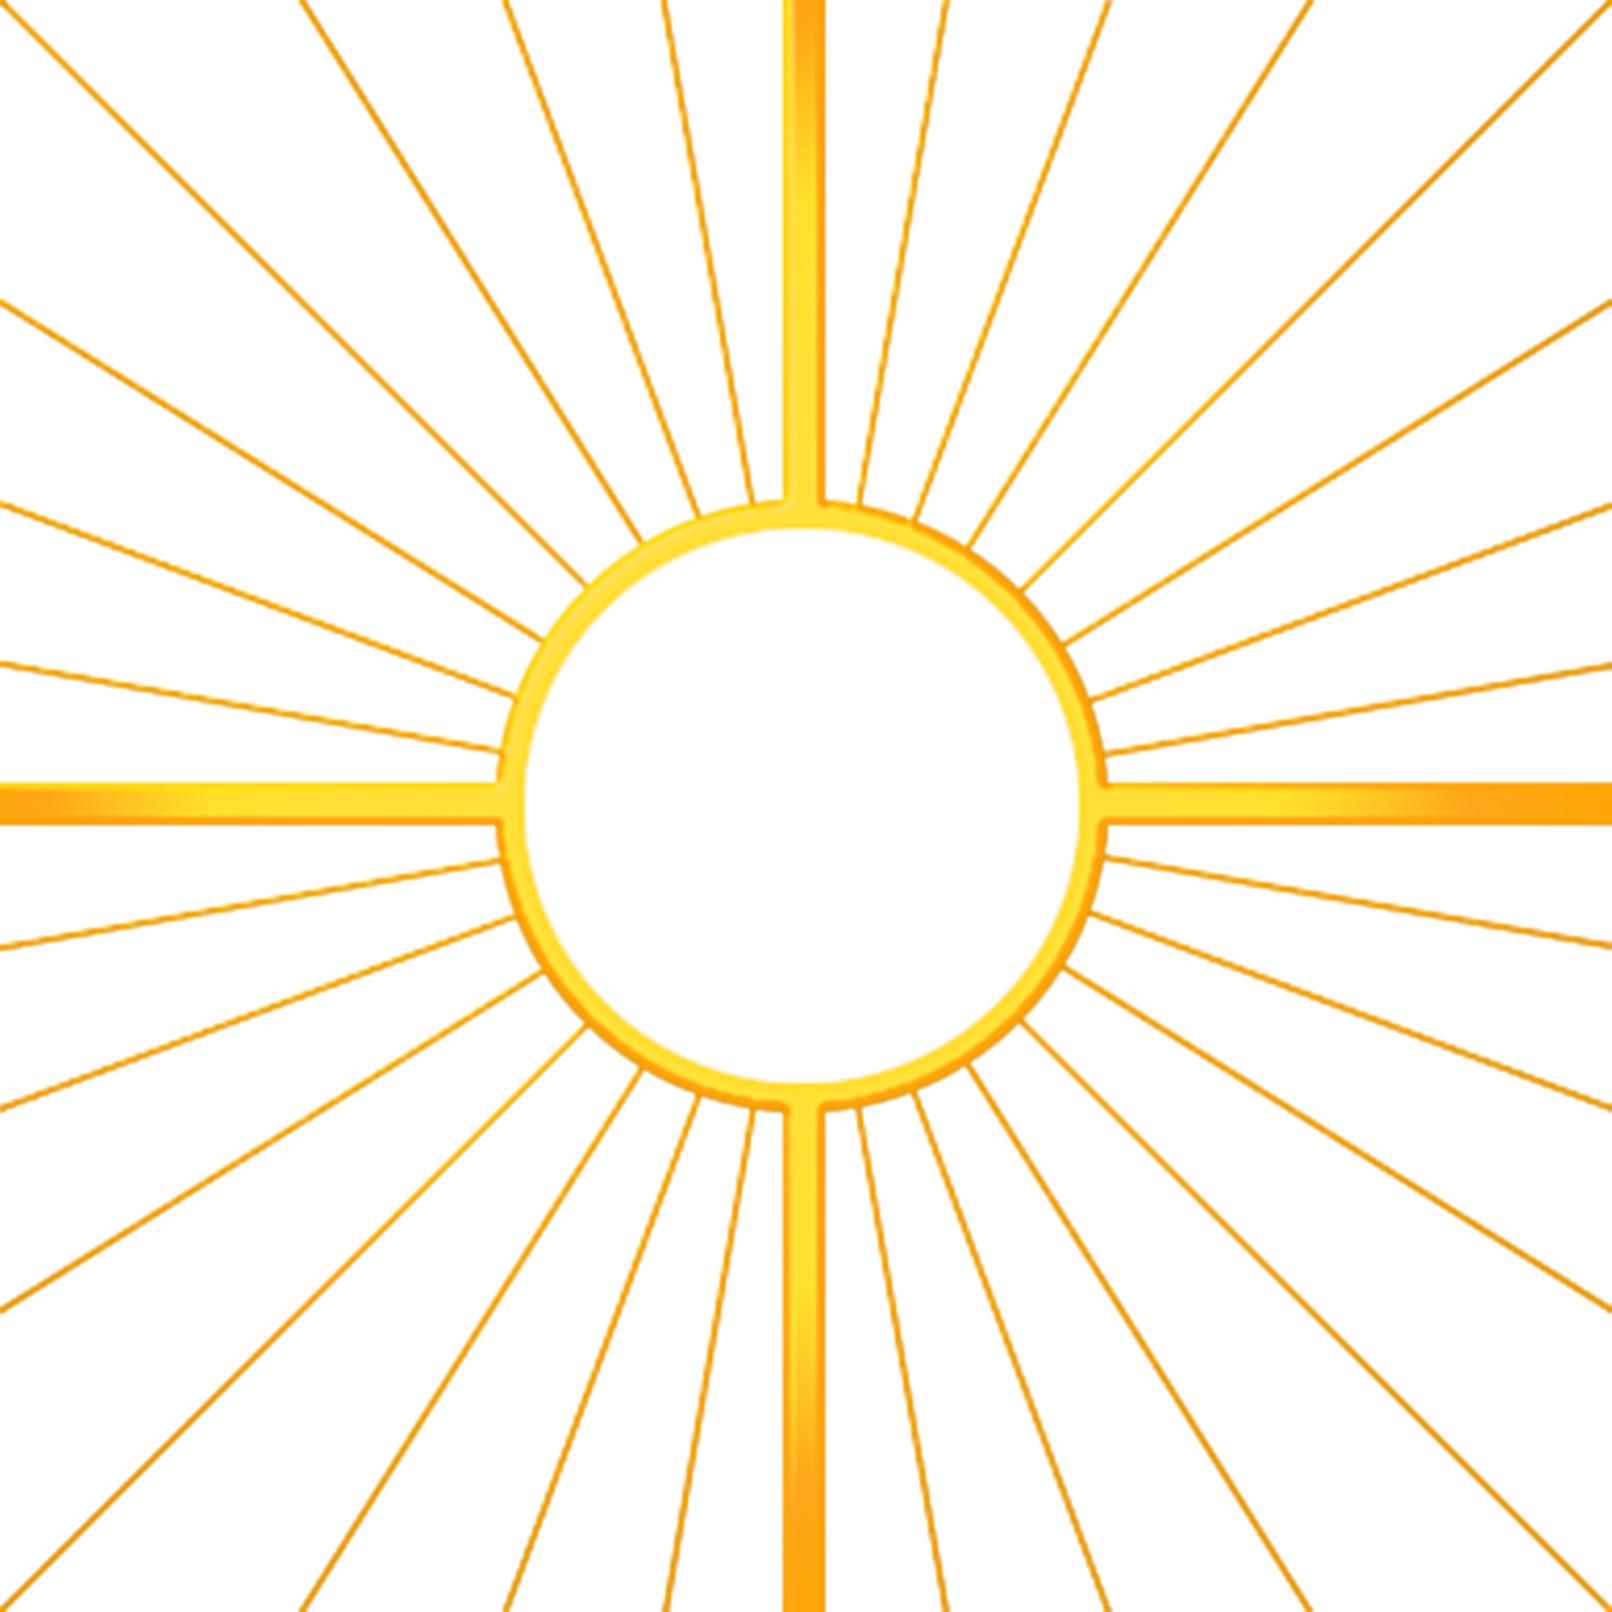 Emblem Liebe-Licht-Kreis Jesu Christi